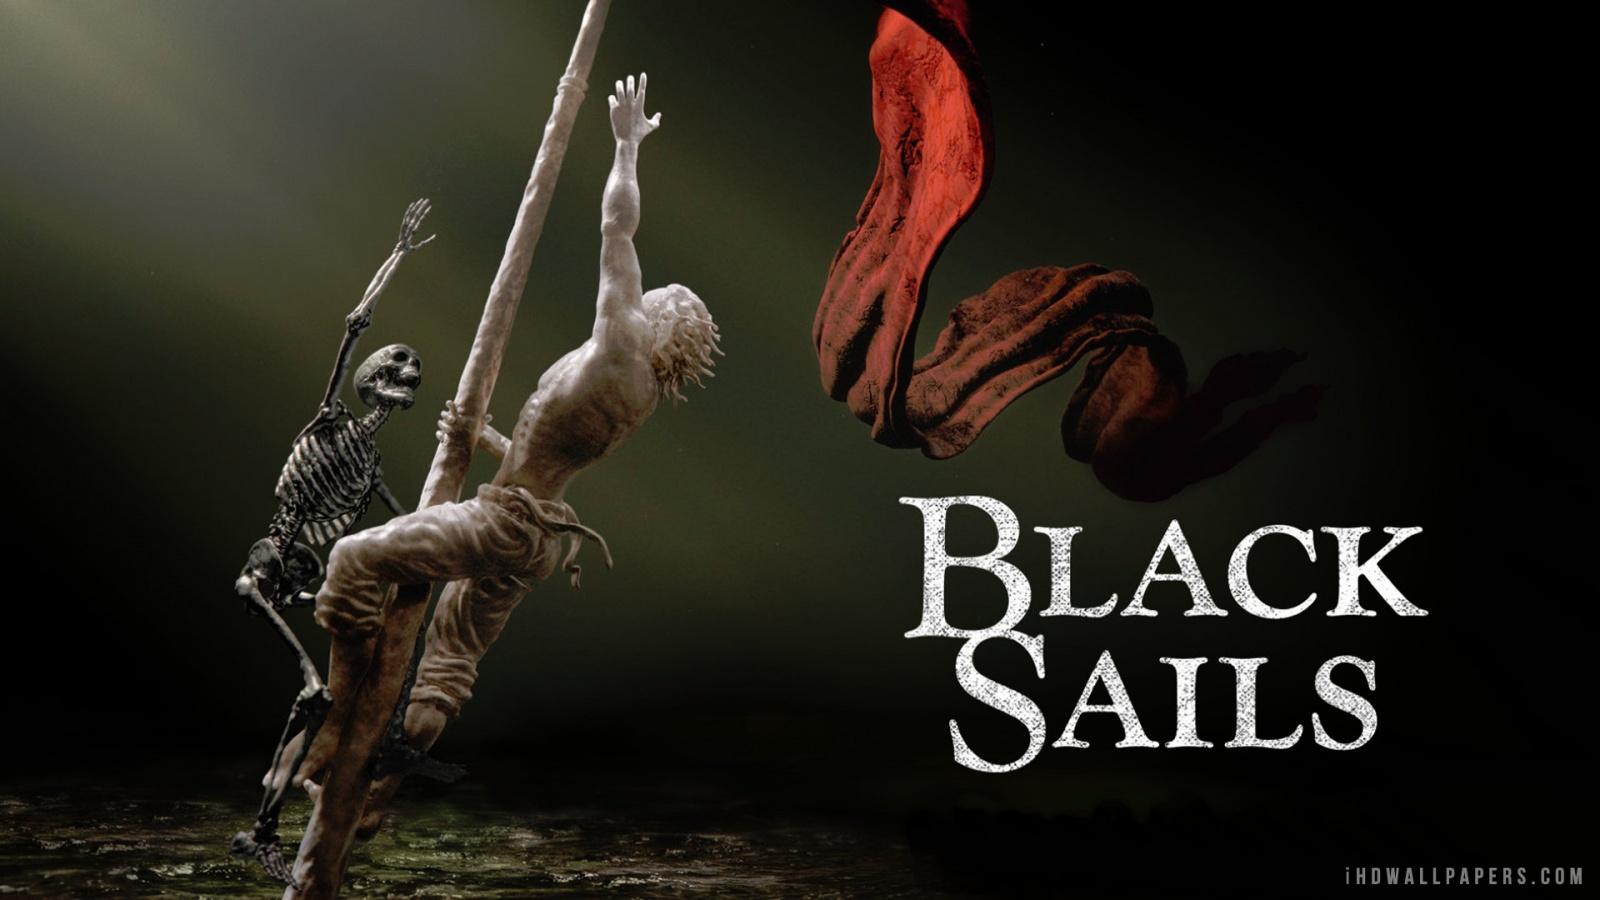 Black Sails Season 2 HD Wallpaper   iHD Wallpapers 1600x900